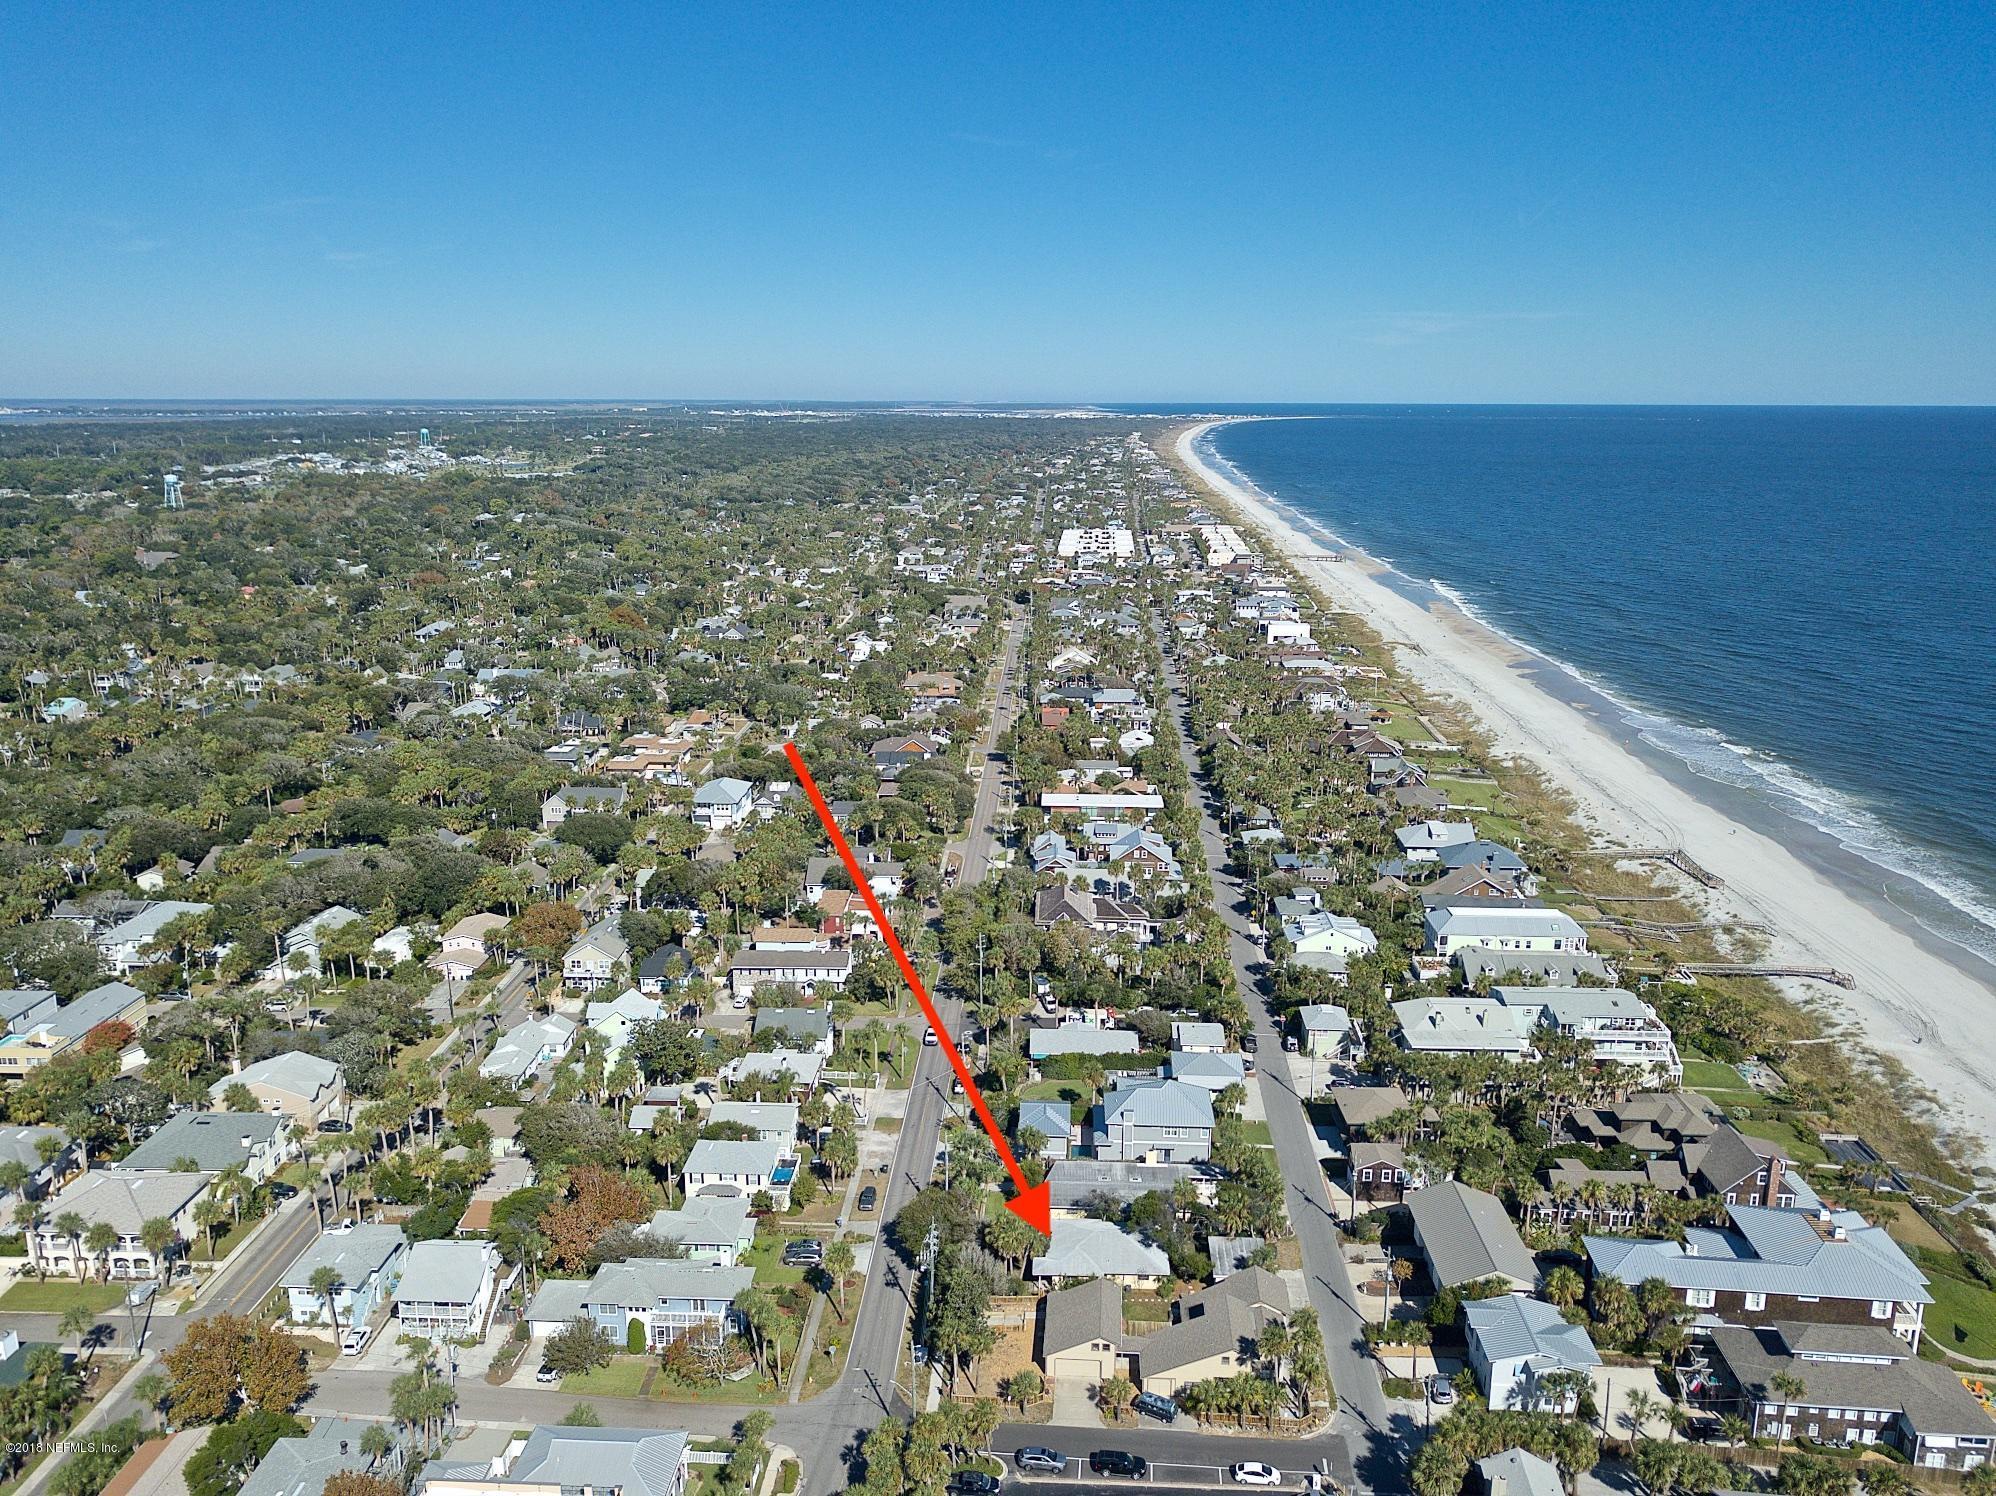 128 BEACH, ATLANTIC BEACH, FLORIDA 32233, 2 Bedrooms Bedrooms, ,2 BathroomsBathrooms,Residential - single family,For sale,BEACH,964703